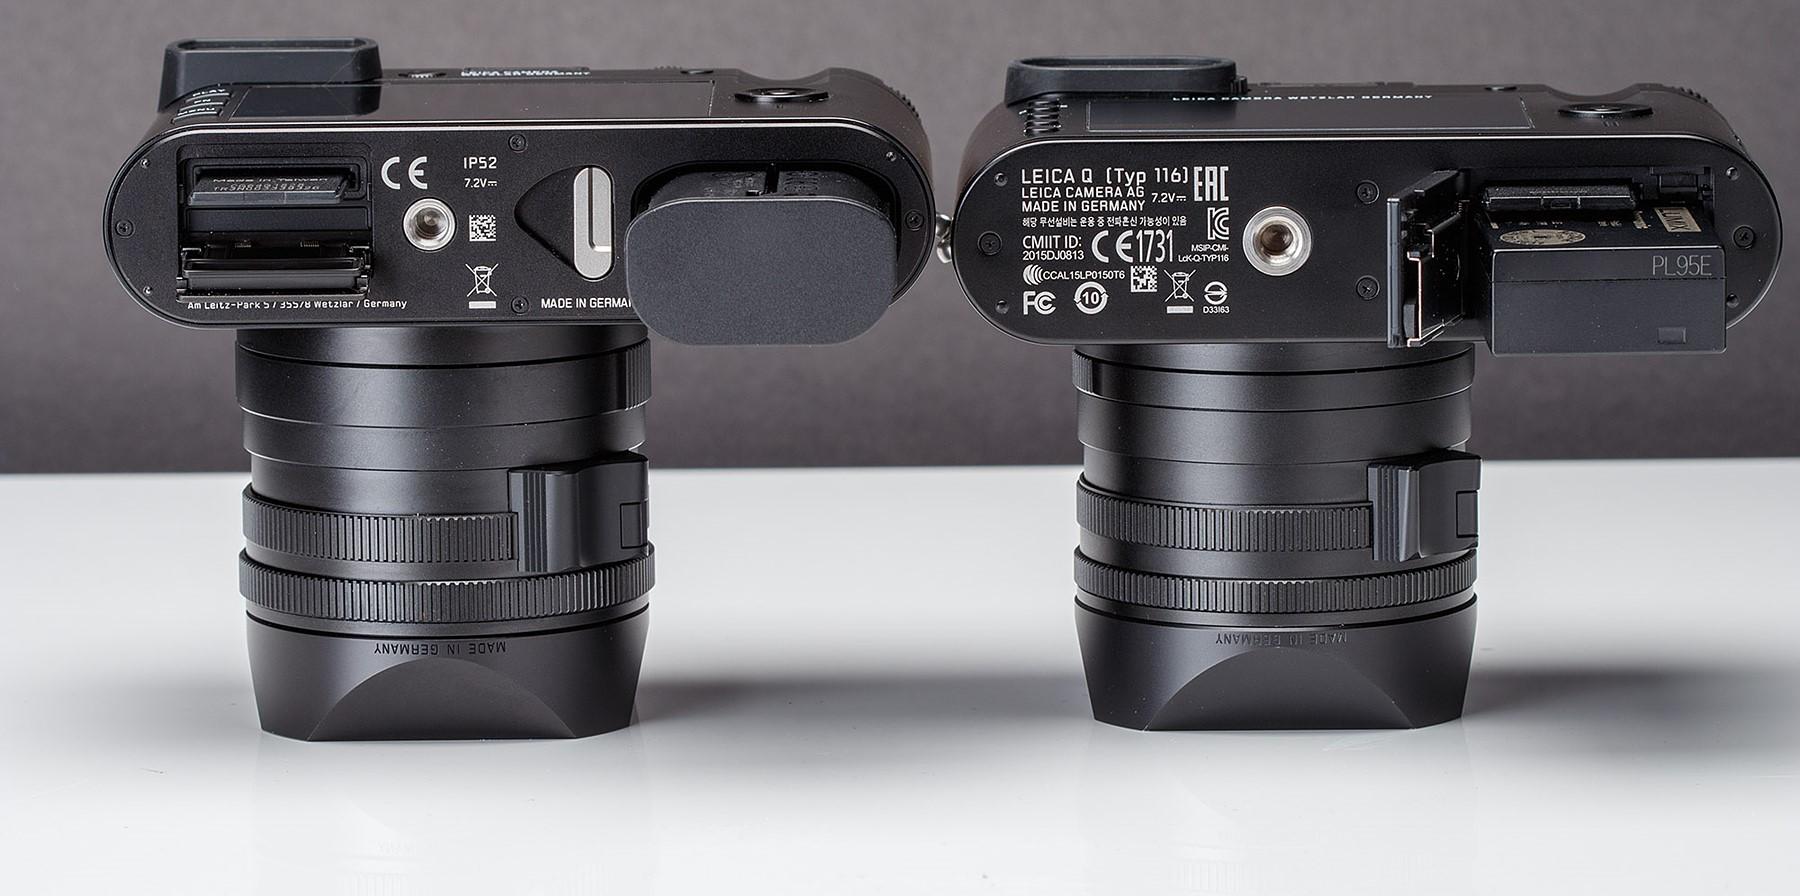 Additional Leica Q2 coverage - Leica Rumors